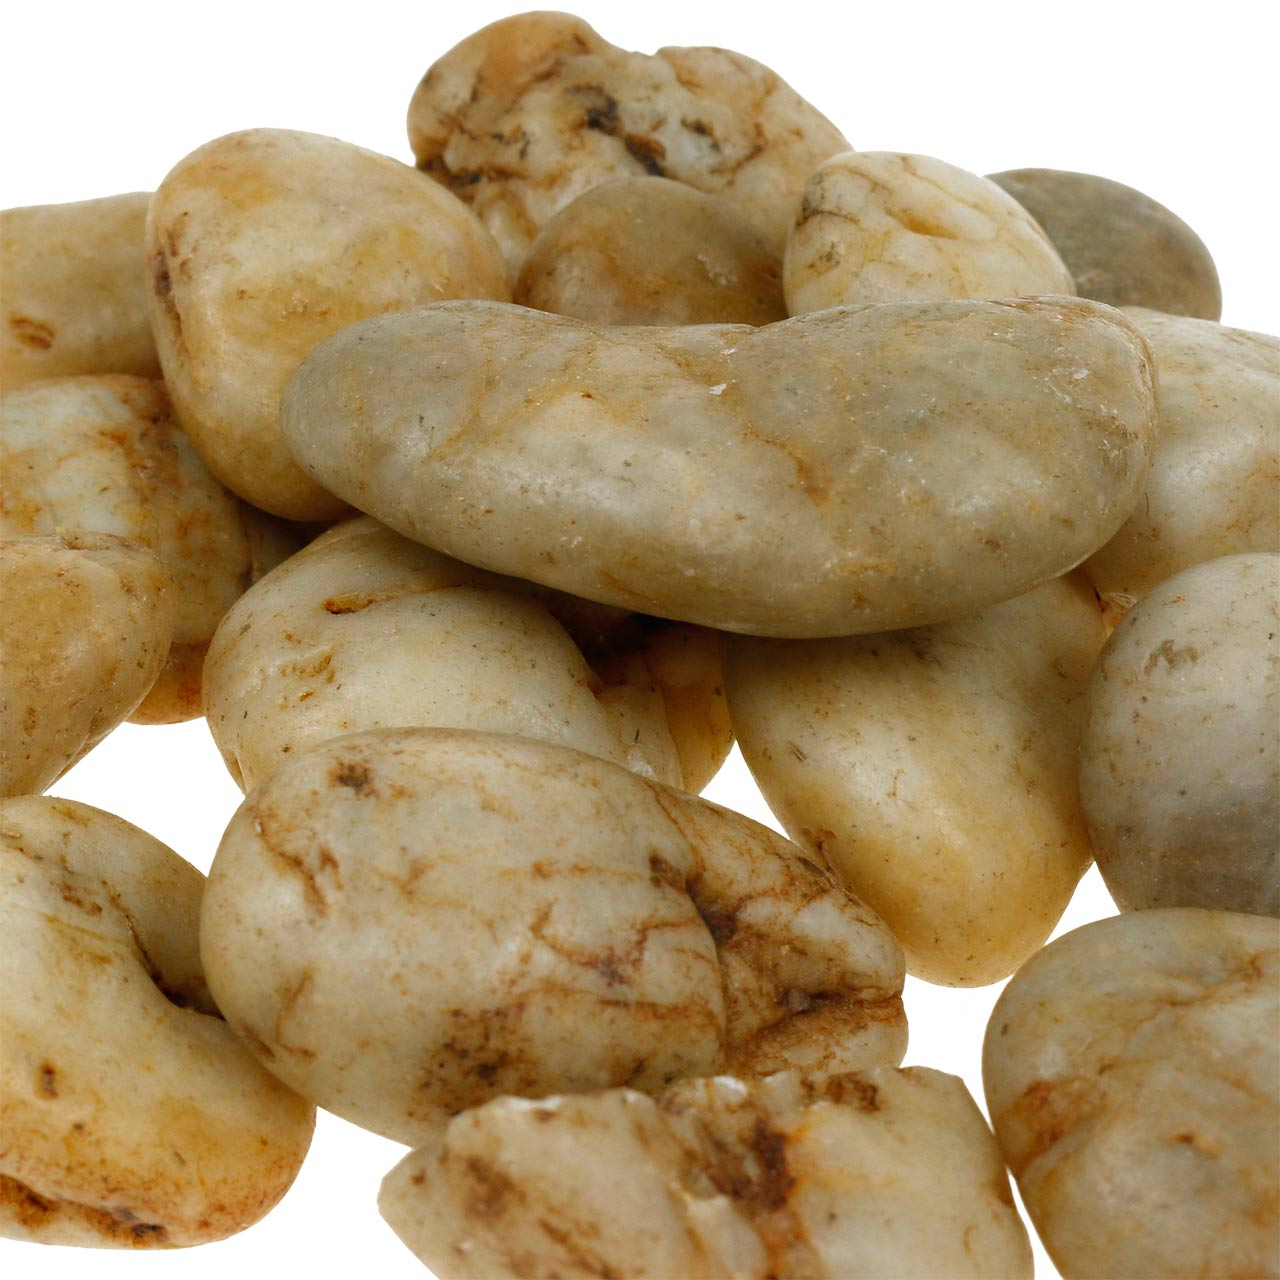 River pebbles naturlig krem 3-5cm 1kg